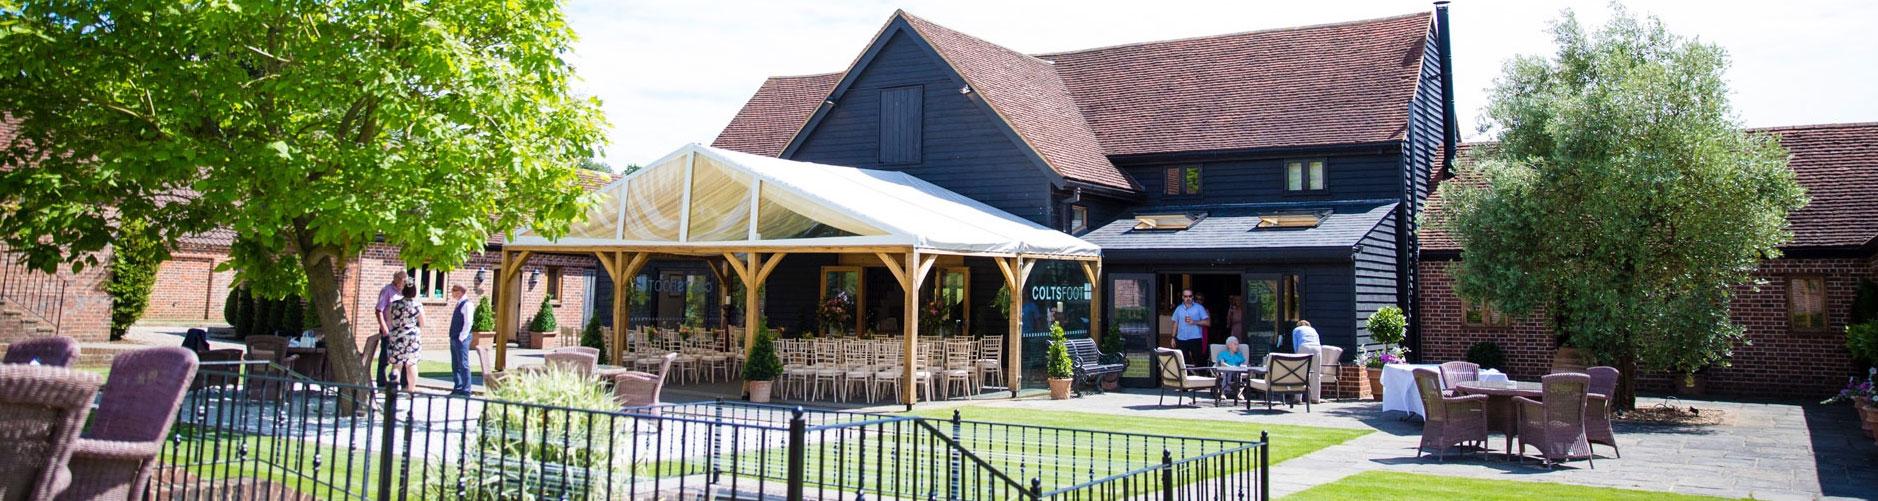 Hertfordshire Venues